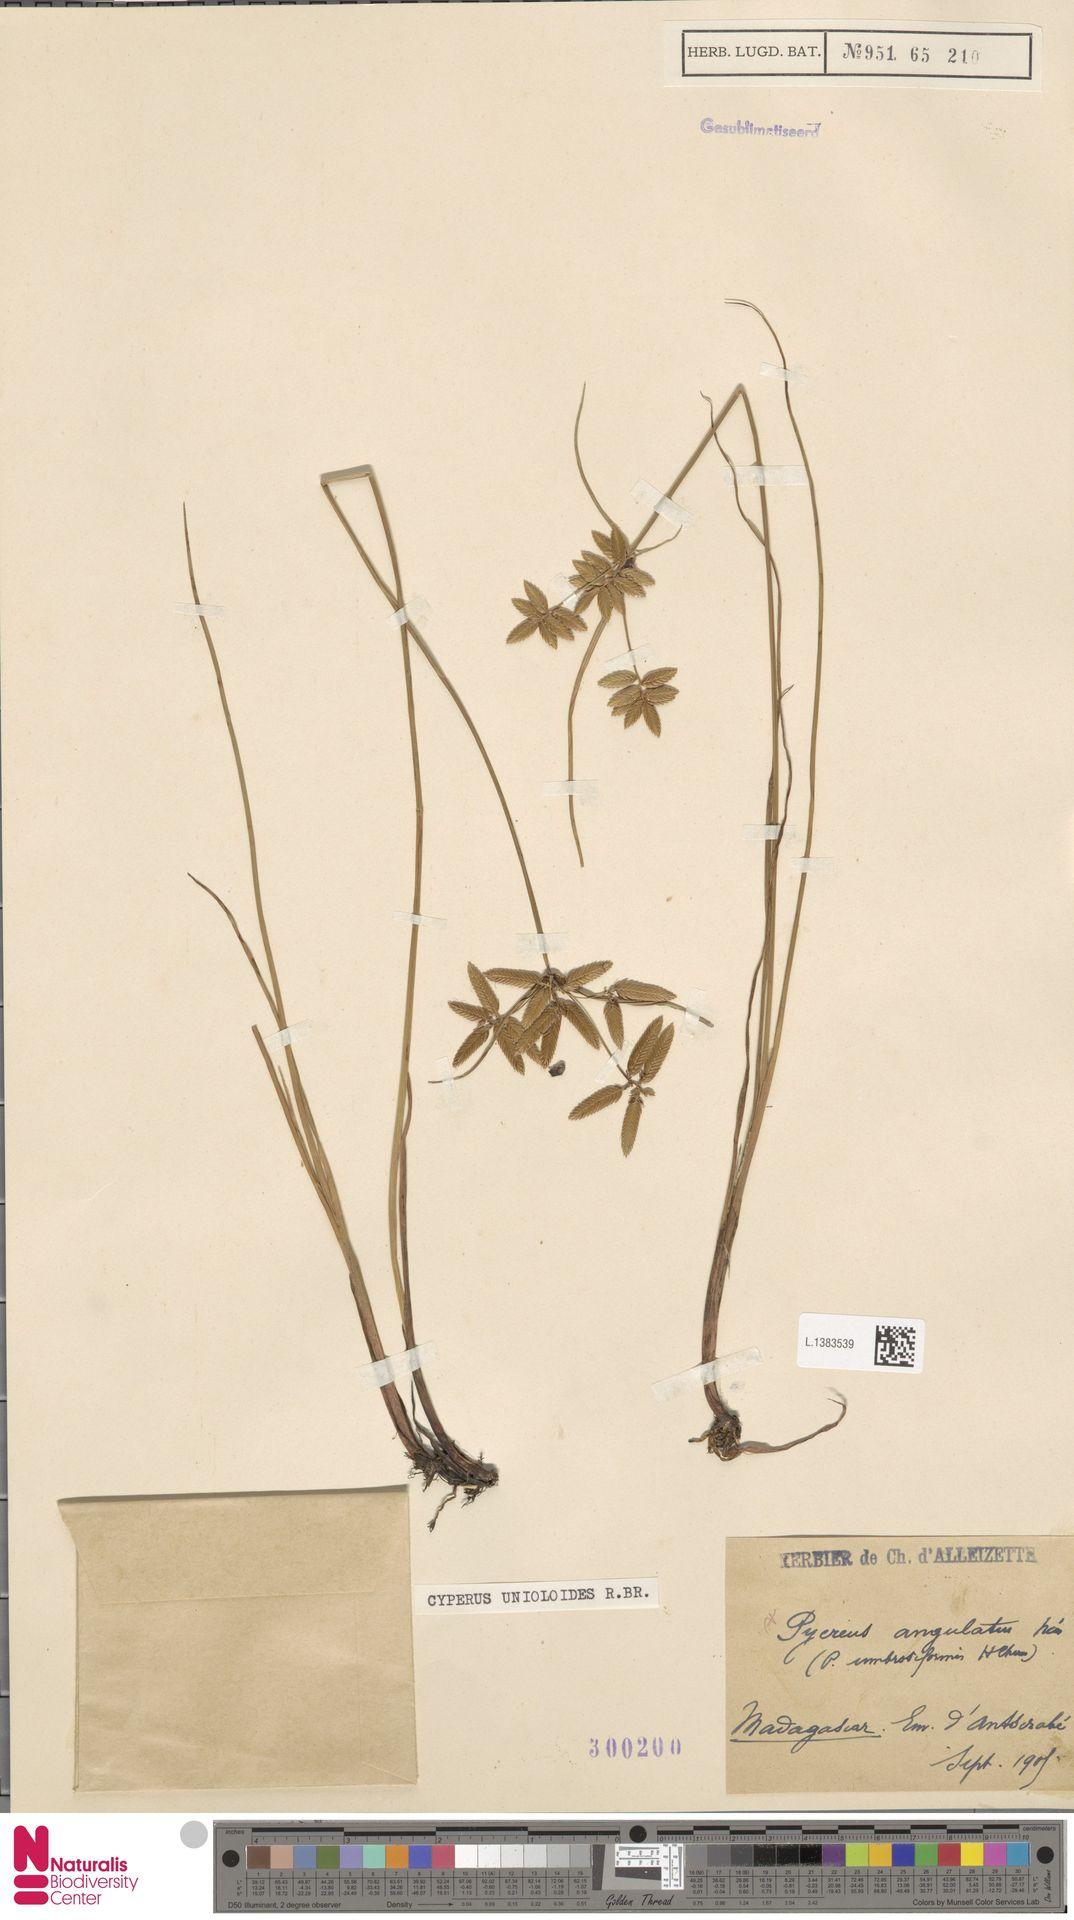 L.1383539 | Cyperus unioloides R.Br.